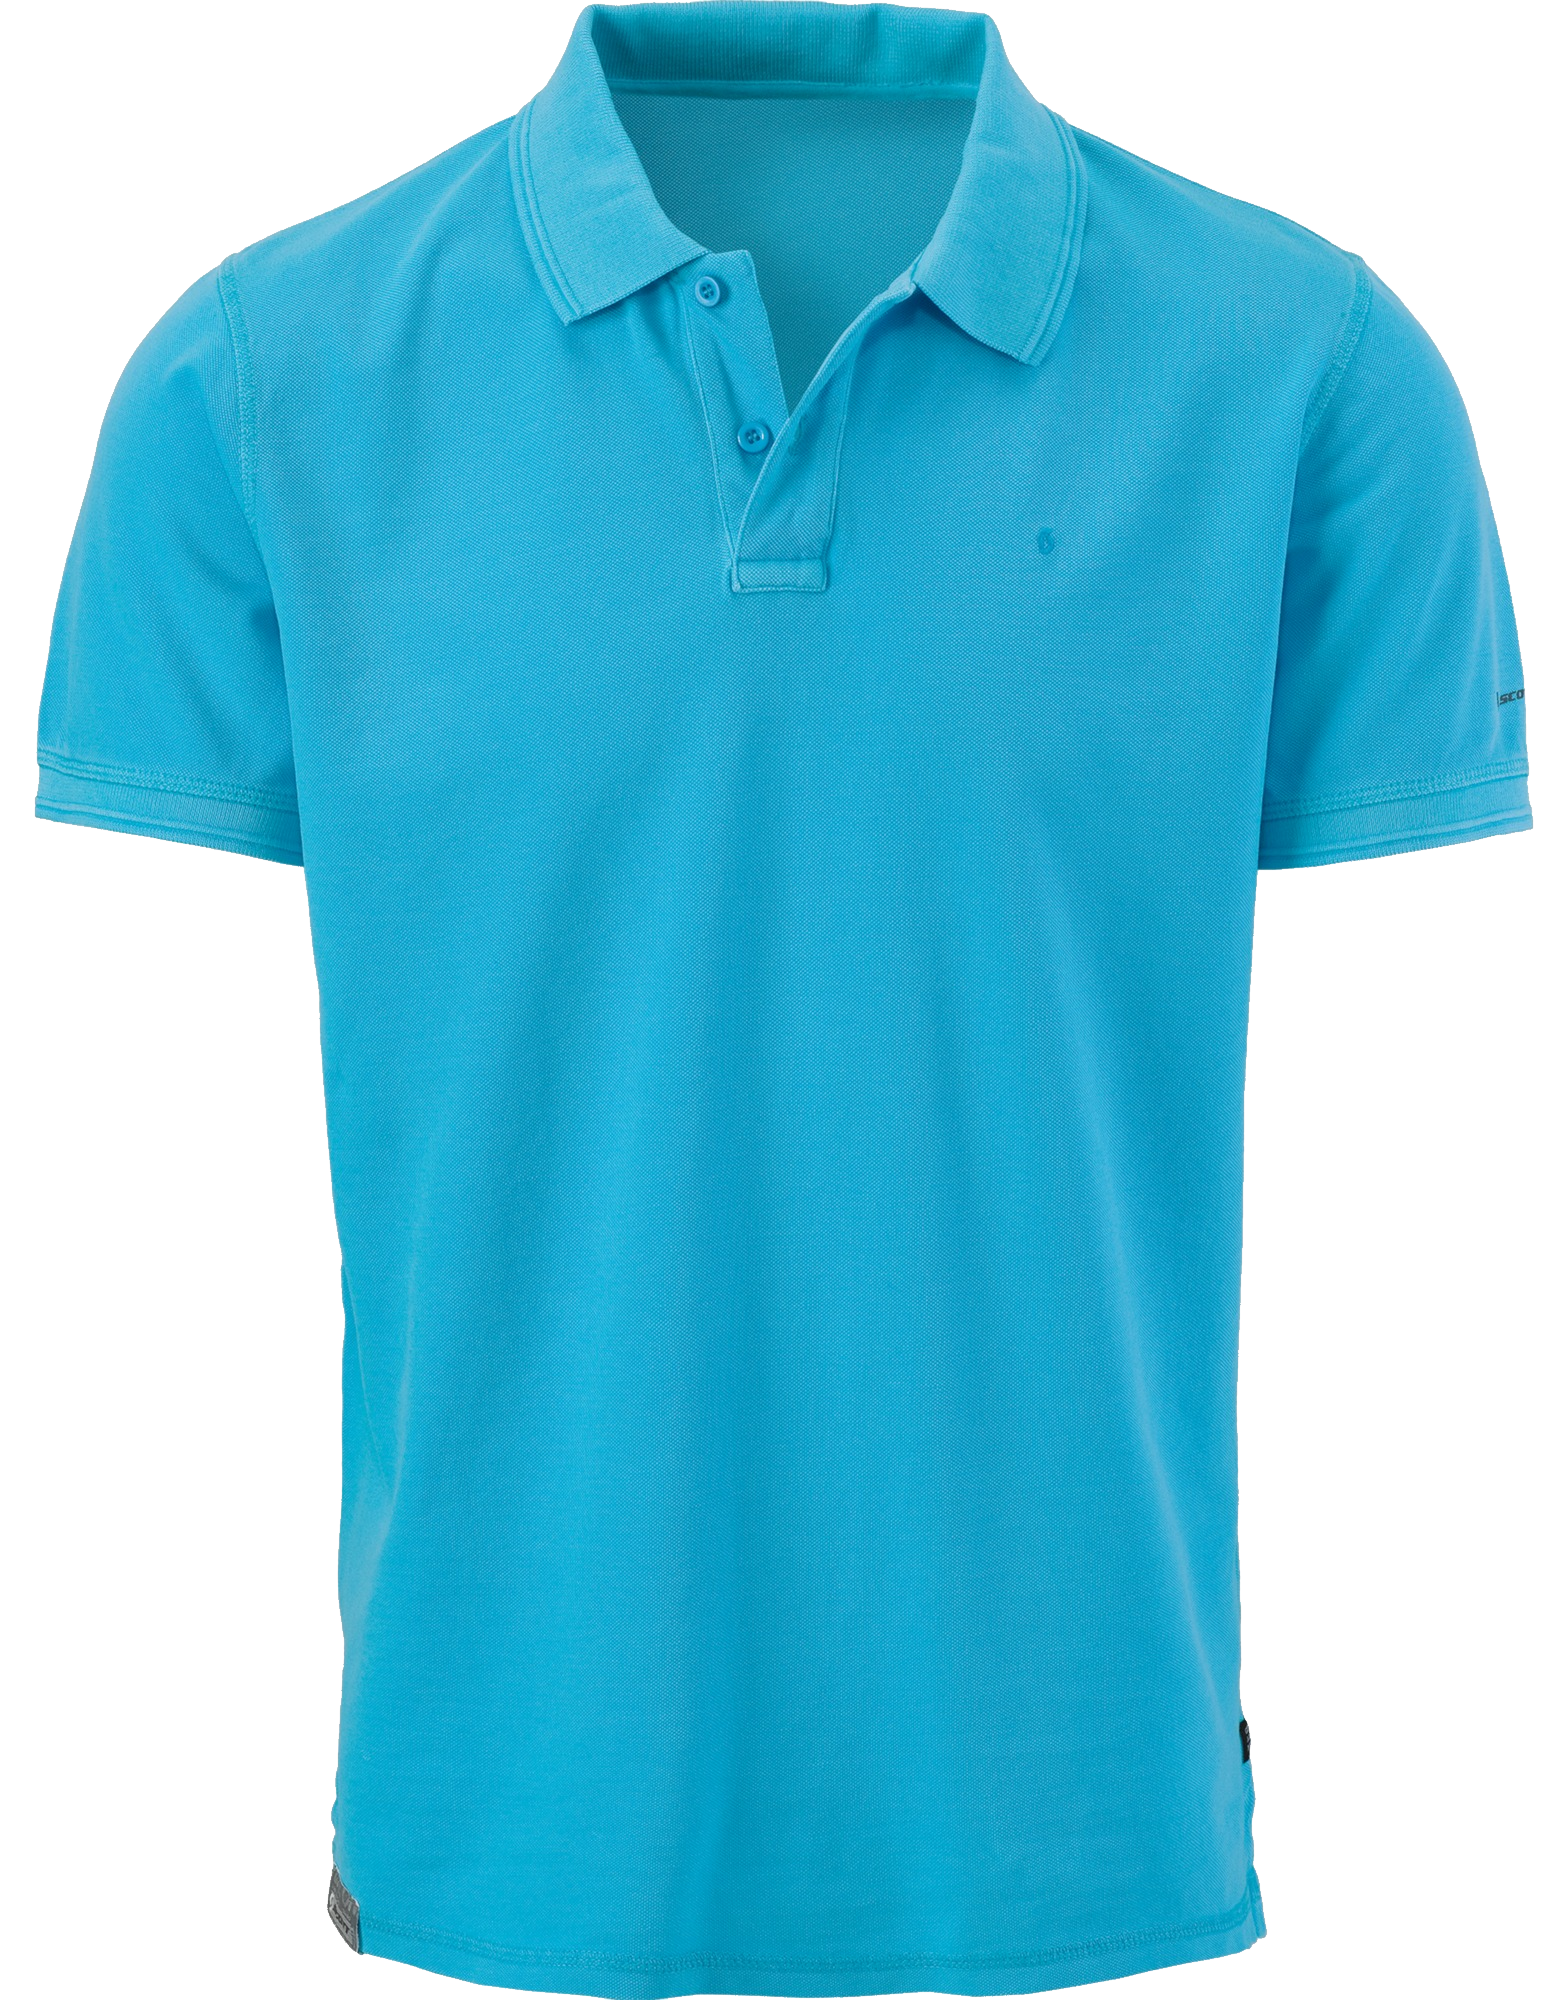 Blue Men's Polo Shirt PNG Image